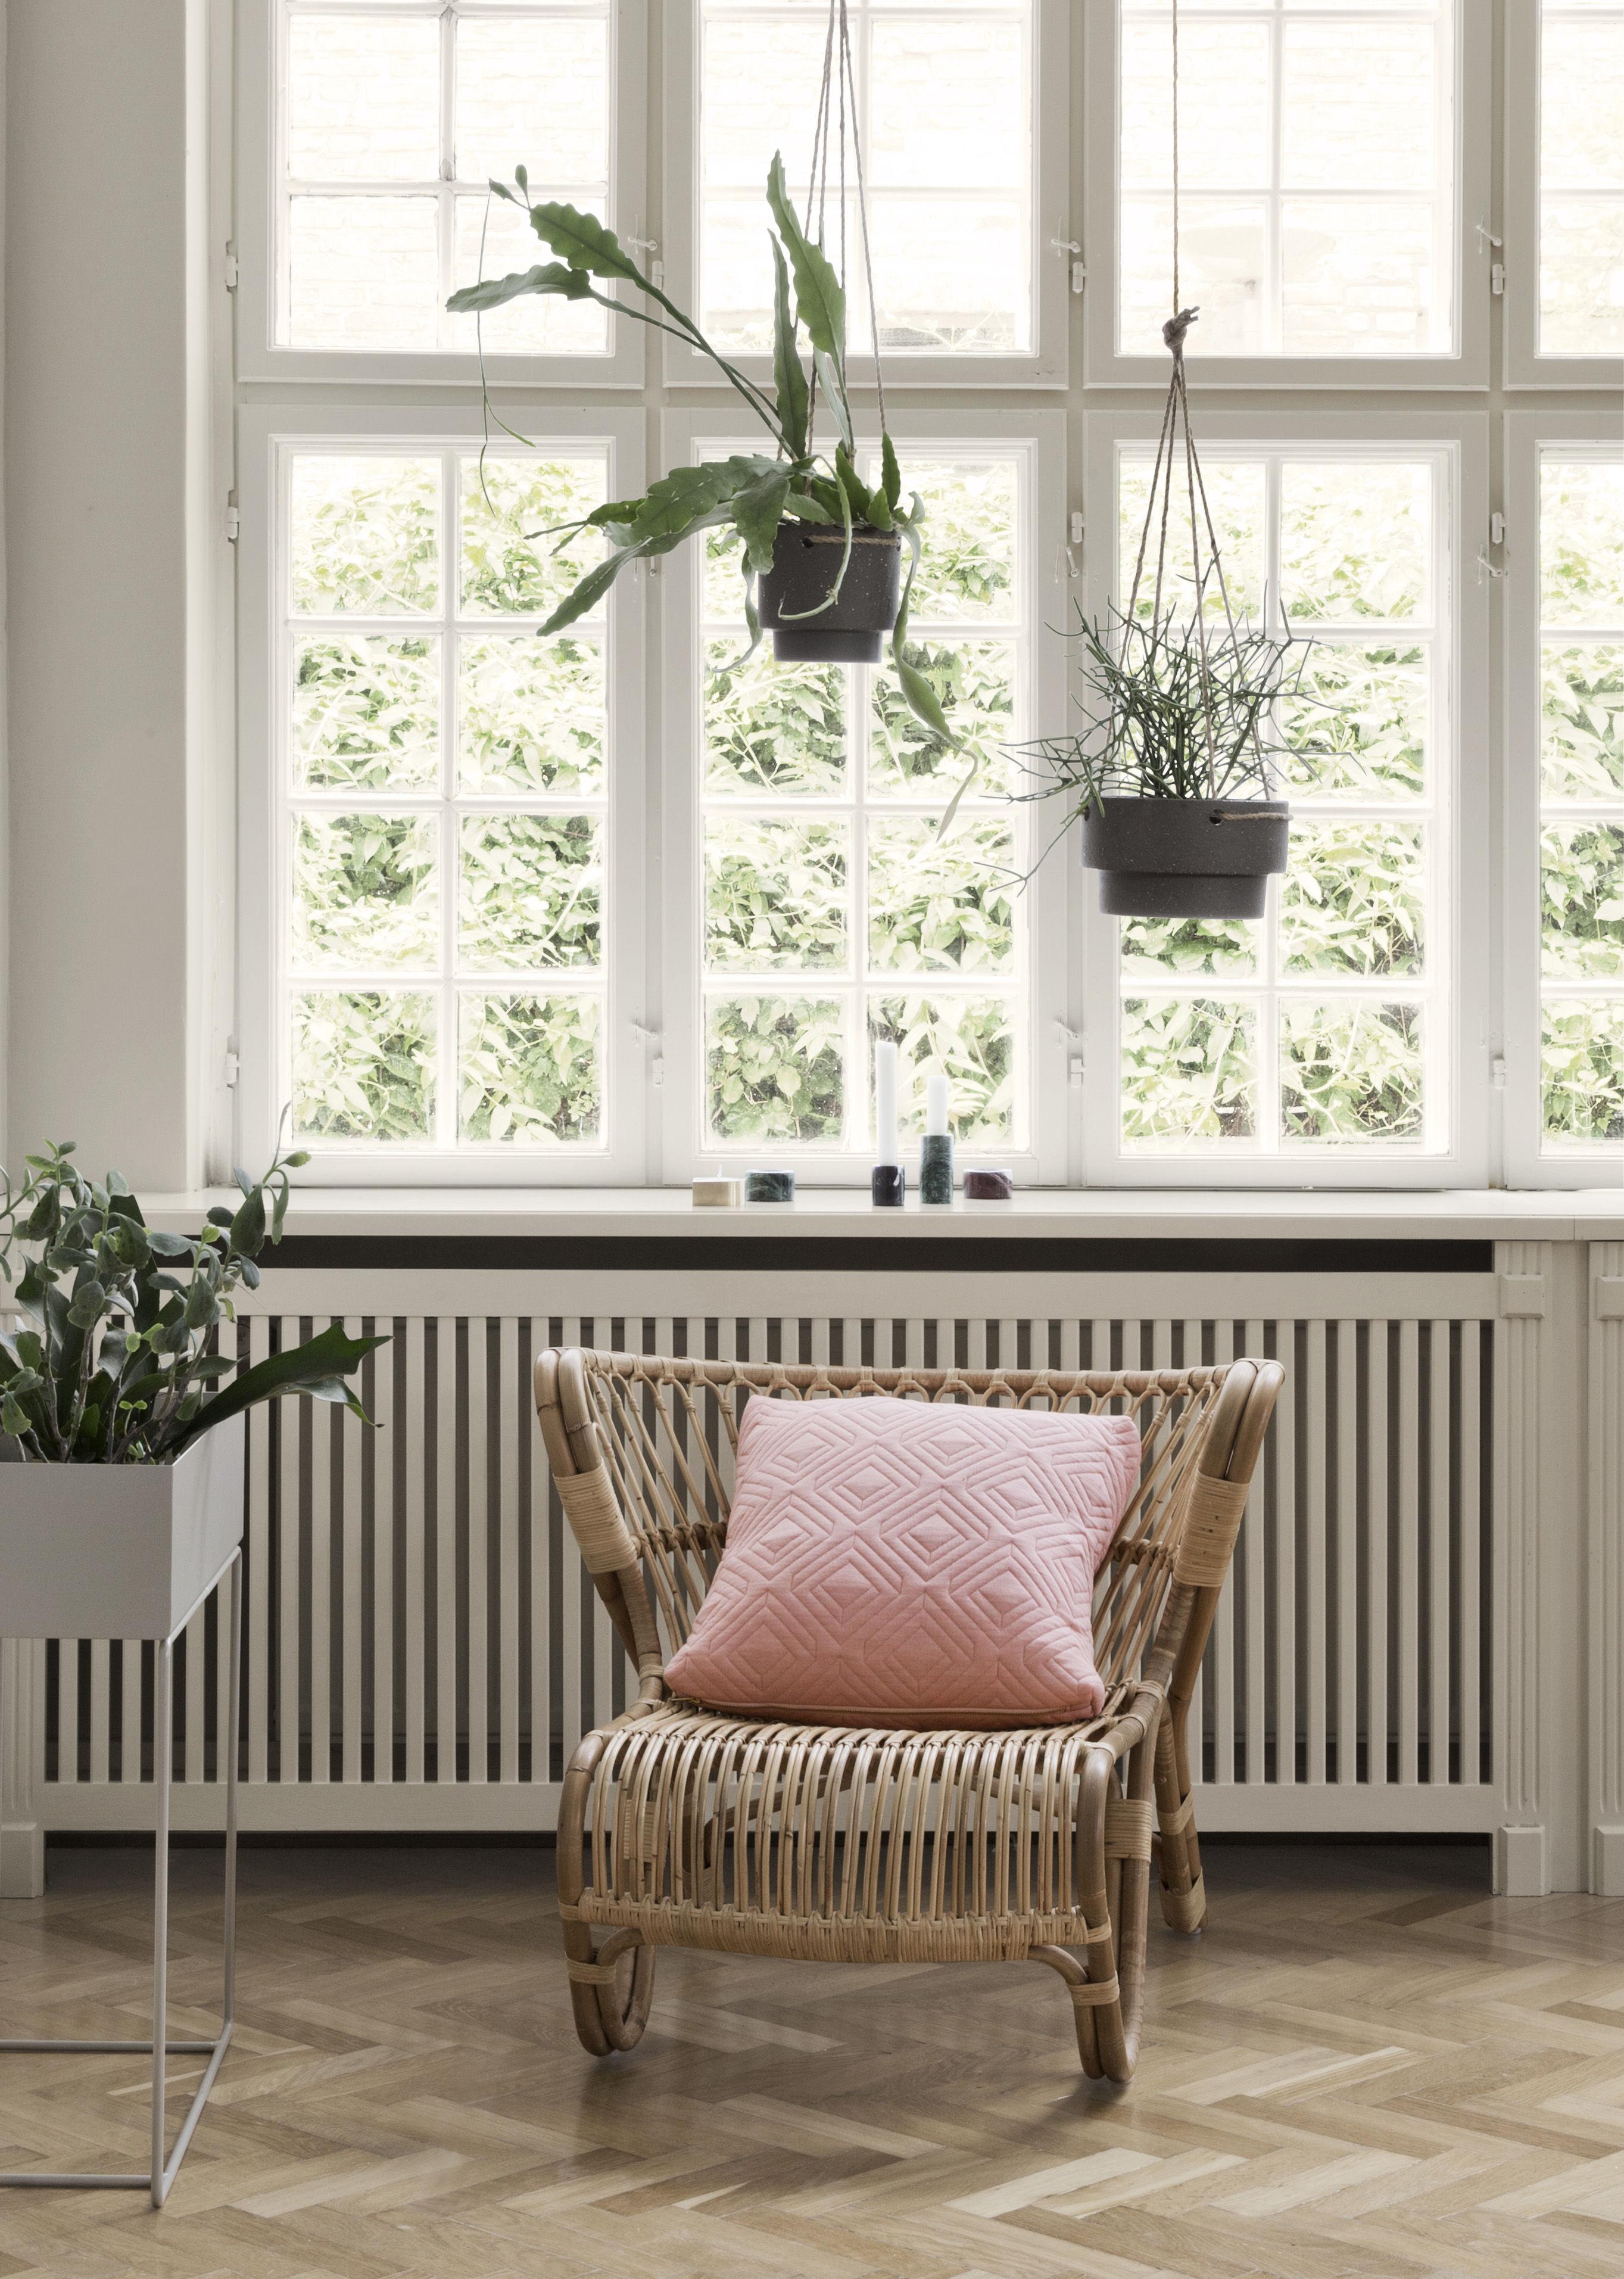 quilt 45 x 45 cm ferm living kissen. Black Bedroom Furniture Sets. Home Design Ideas